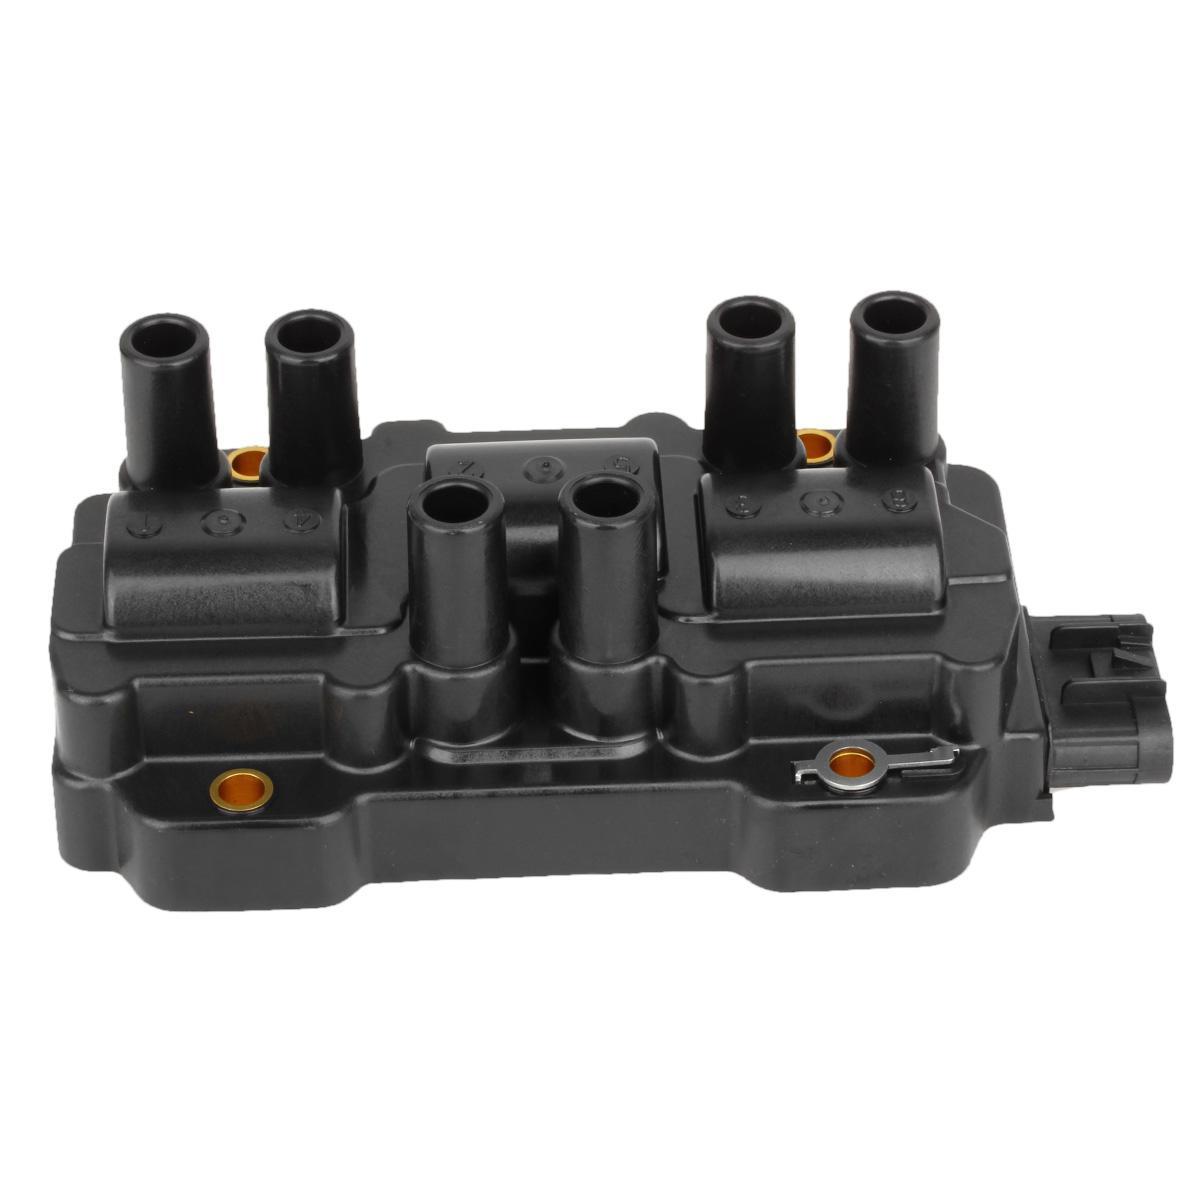 Ignition Coil Engine Light: Ignition Coil For VARIOUS VEHICLES V6 3.4L 3.5L 3.9L 4.3L